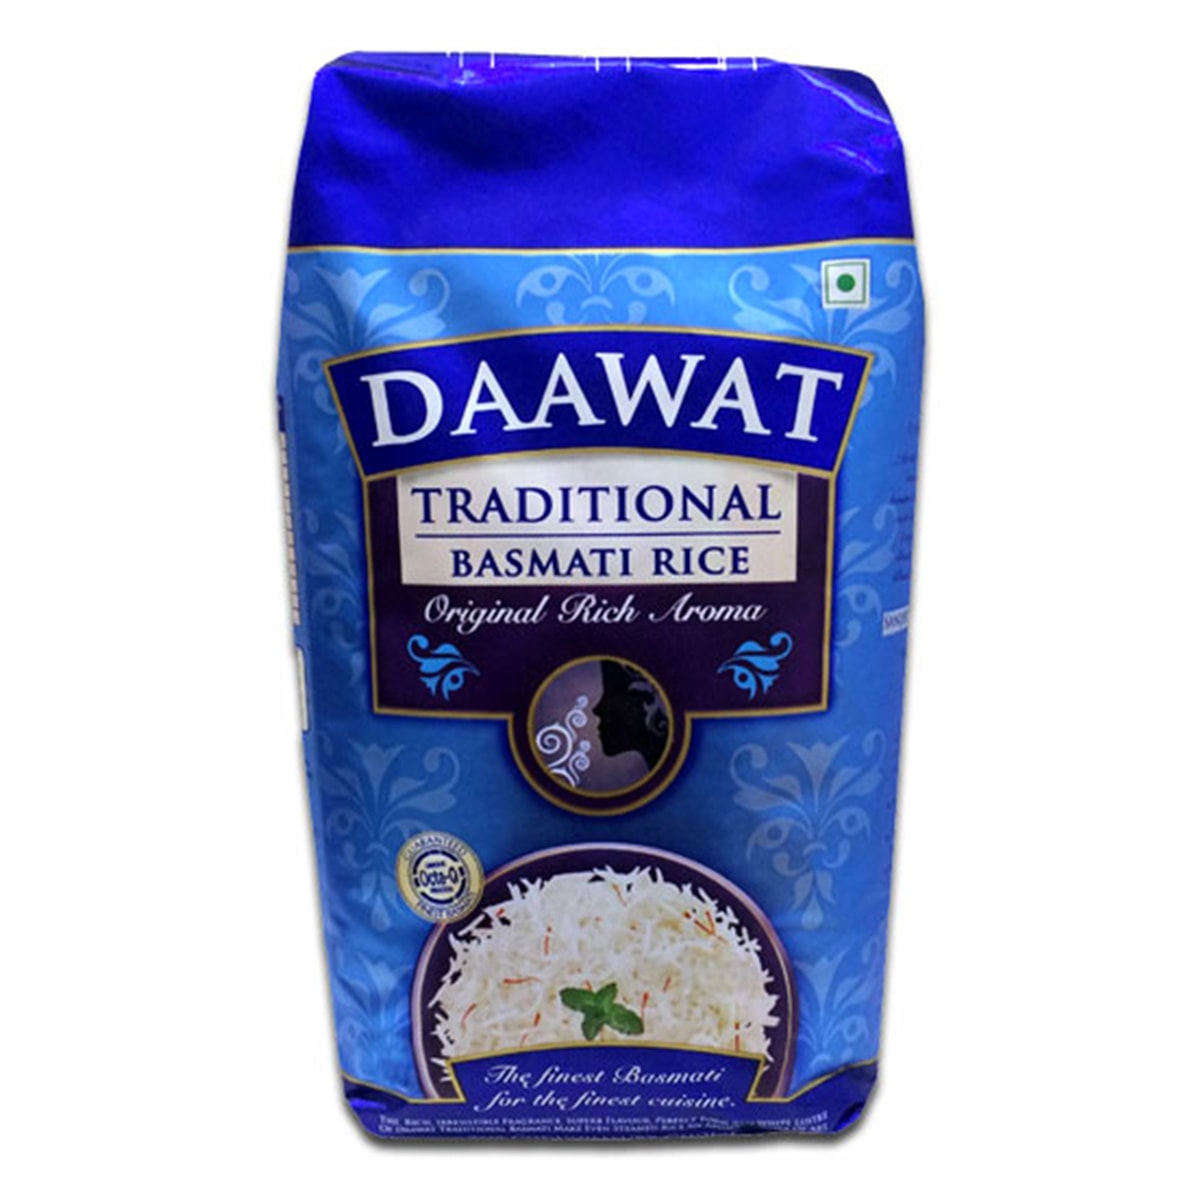 Buy Daawat Traditional Basmati Rice - 1 kg